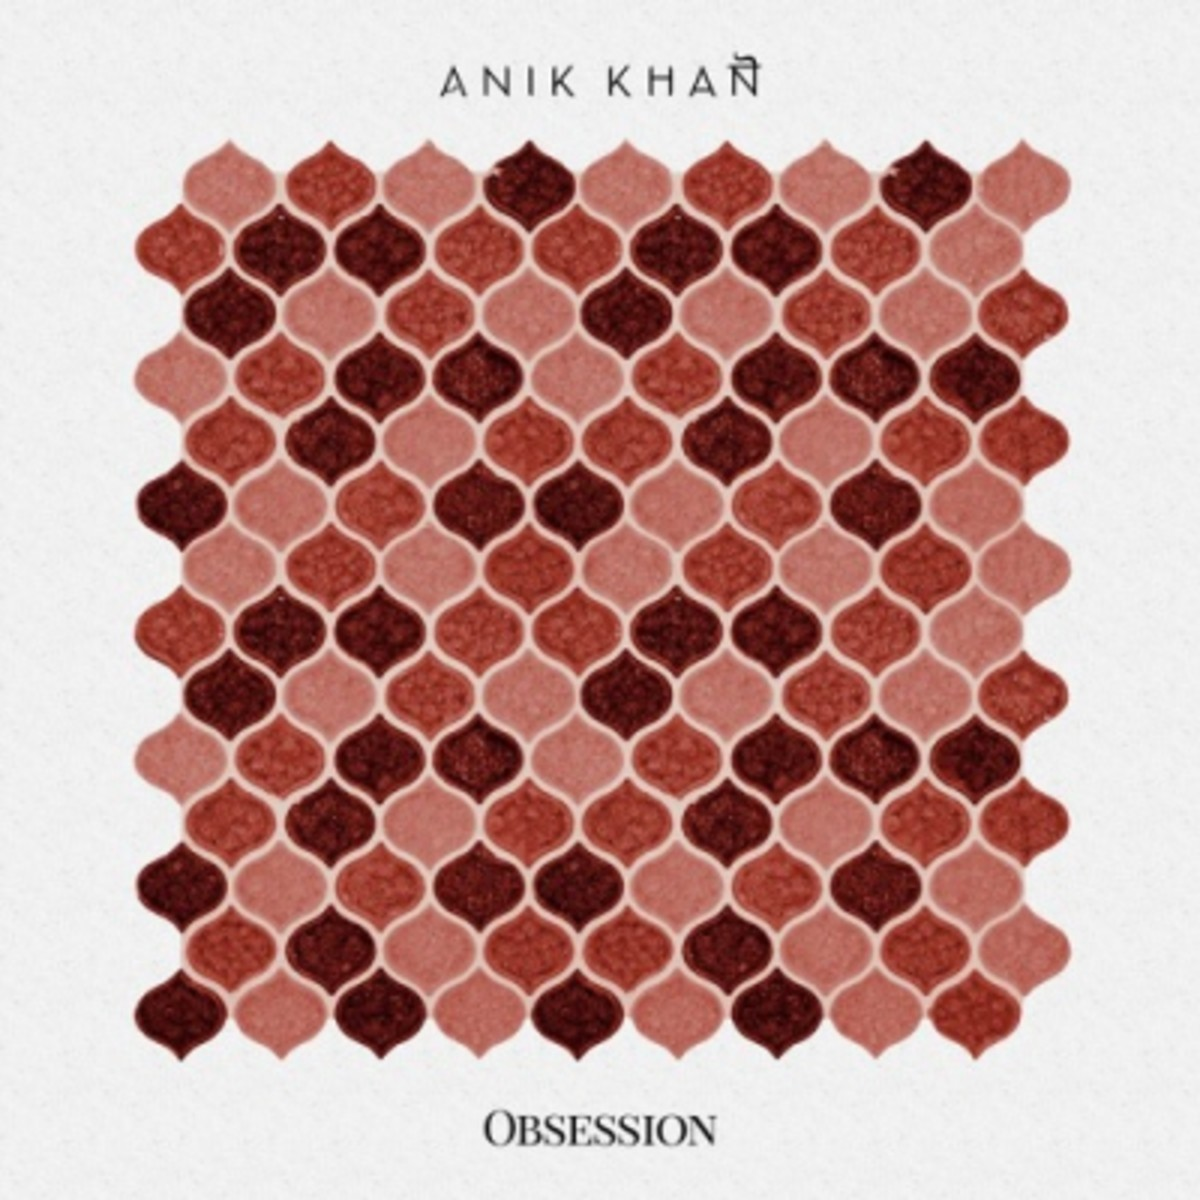 anik-khan-obsession.jpg